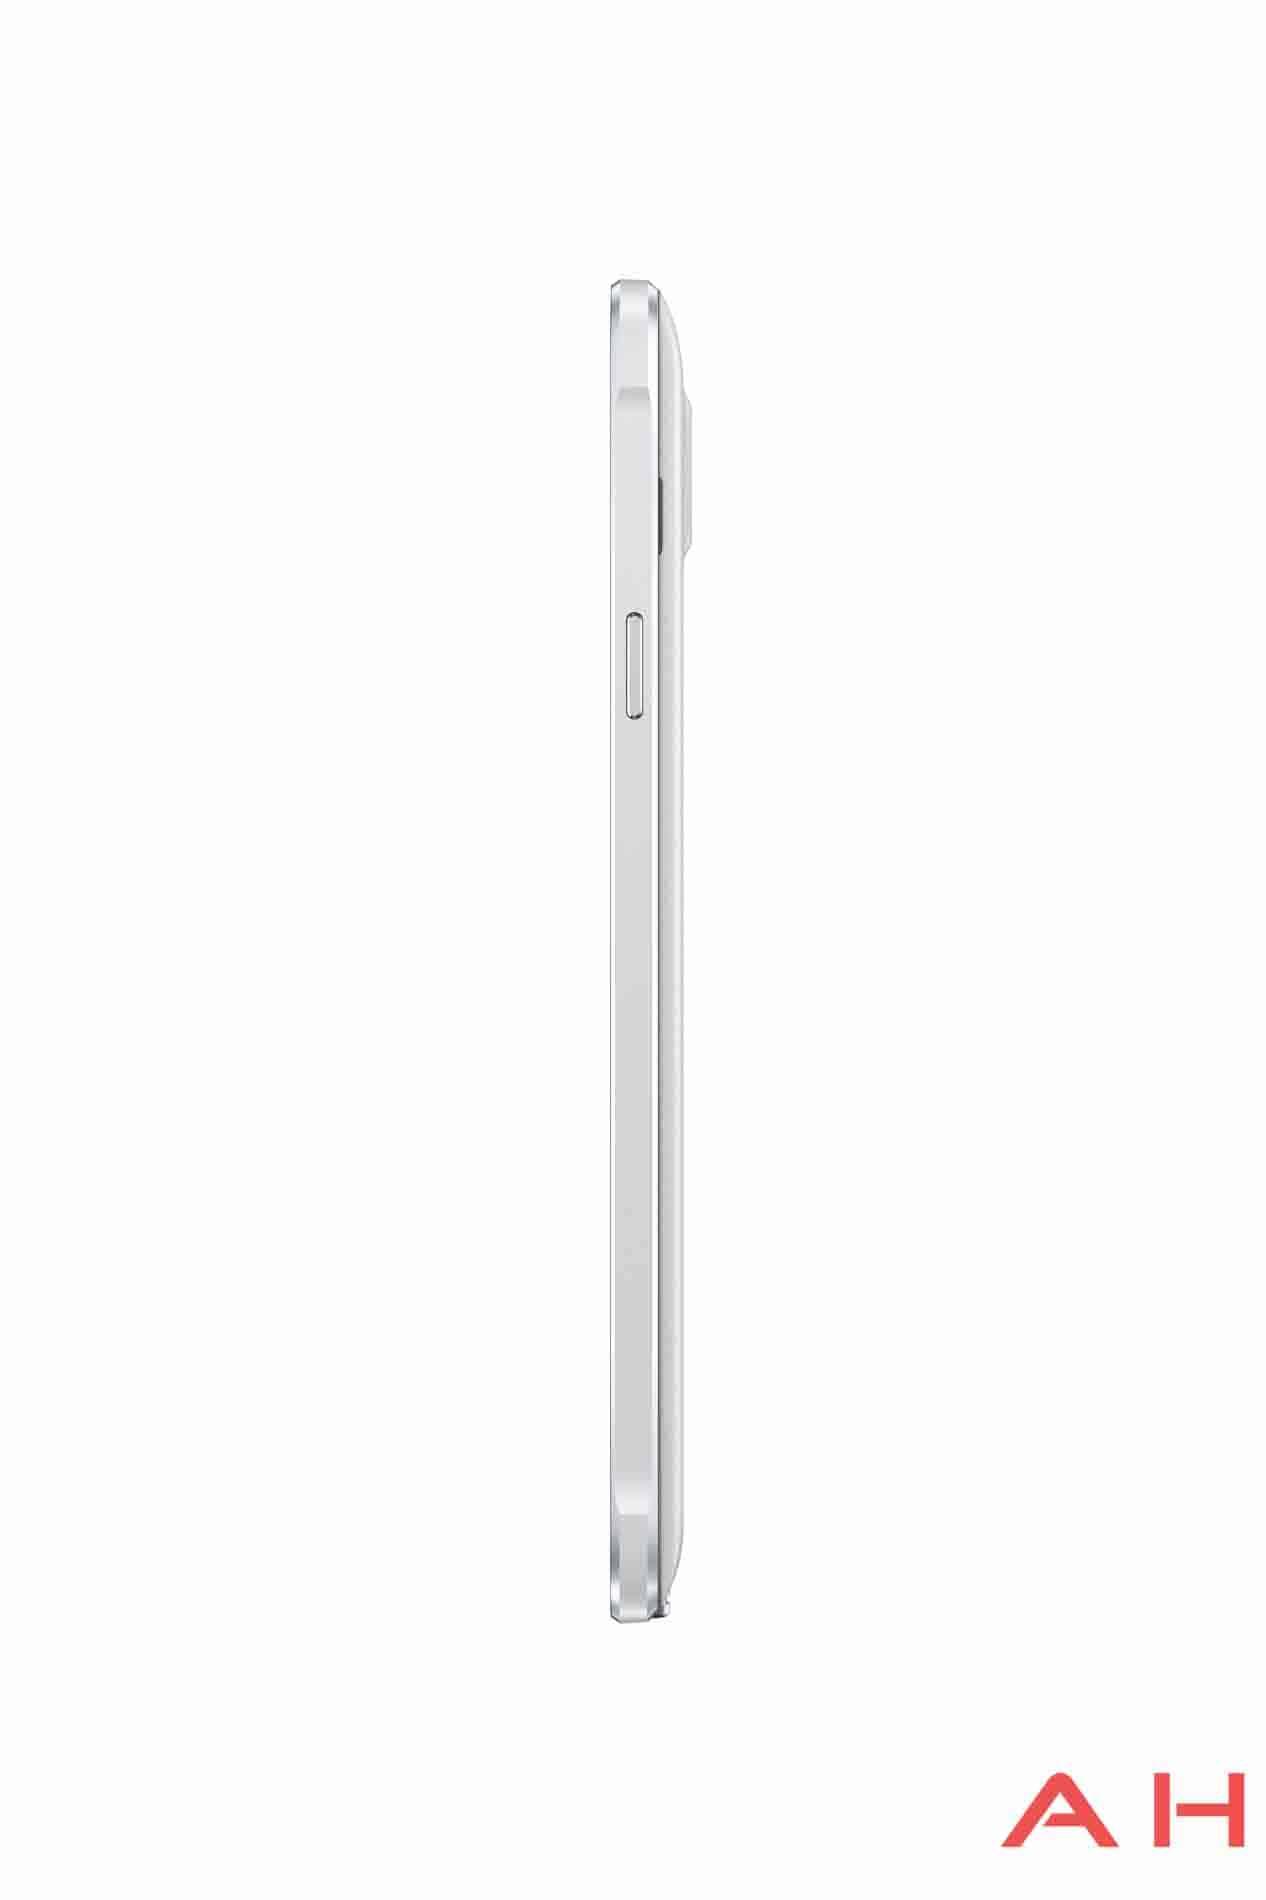 Samsung Galaxy Note 4 AH 15